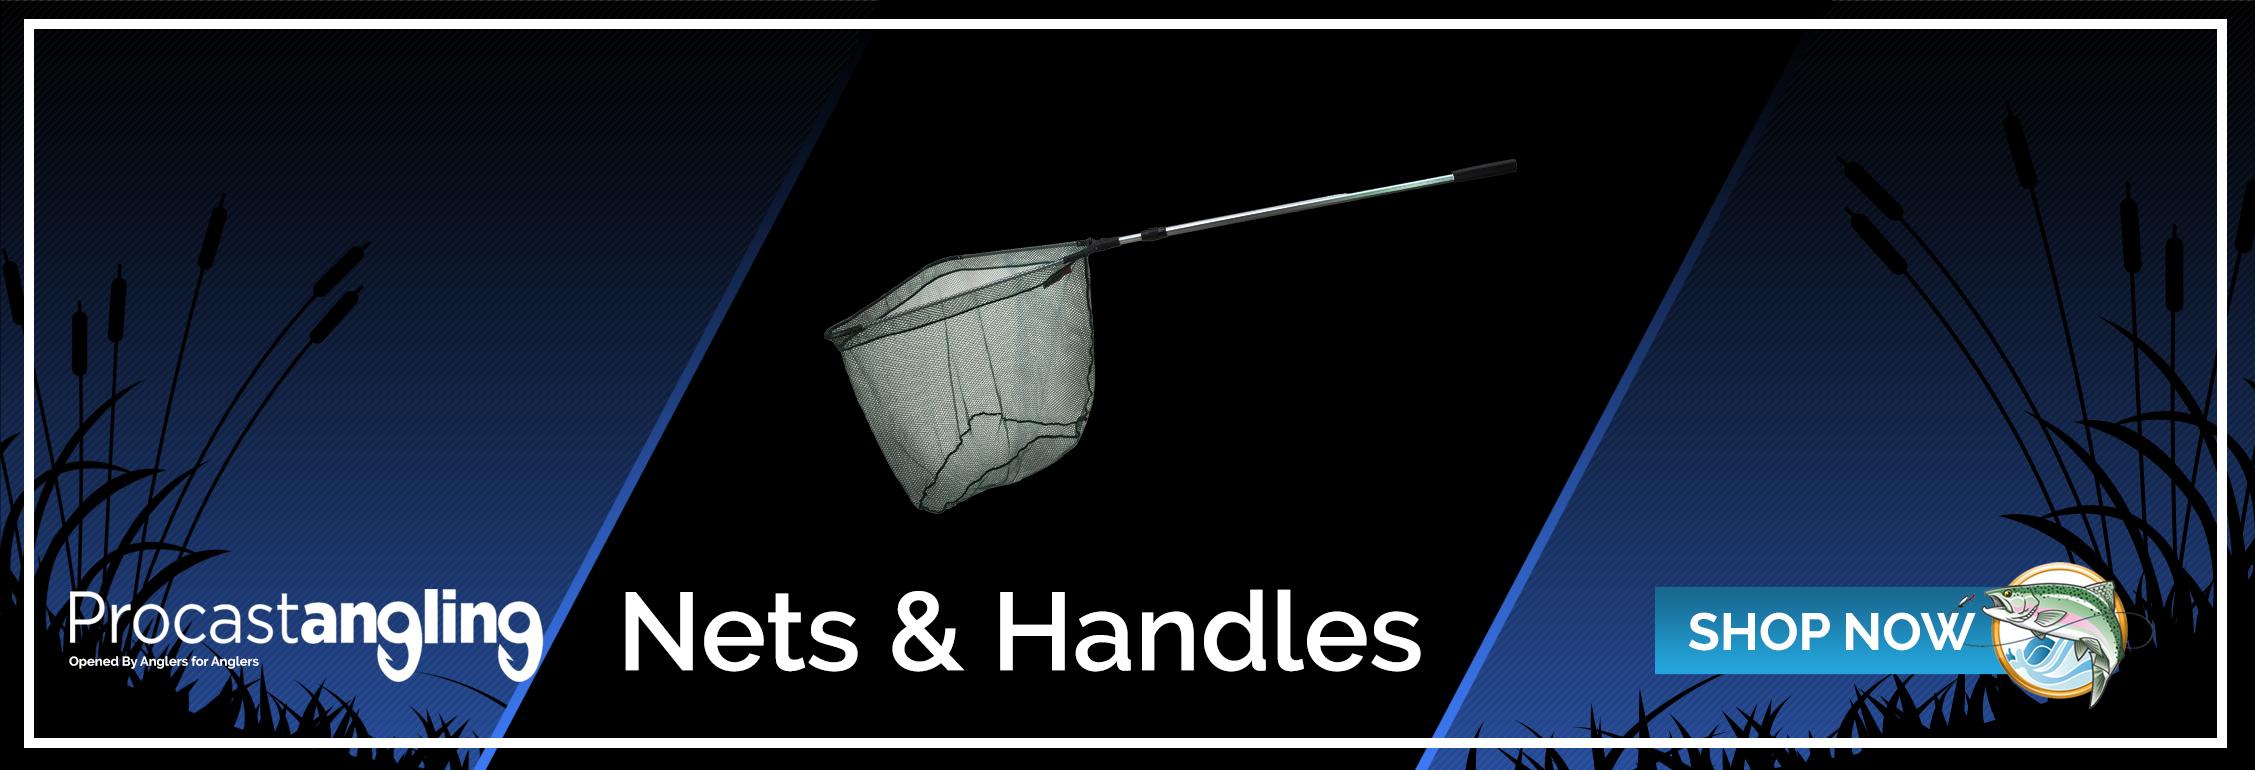 NETS & HANDLES